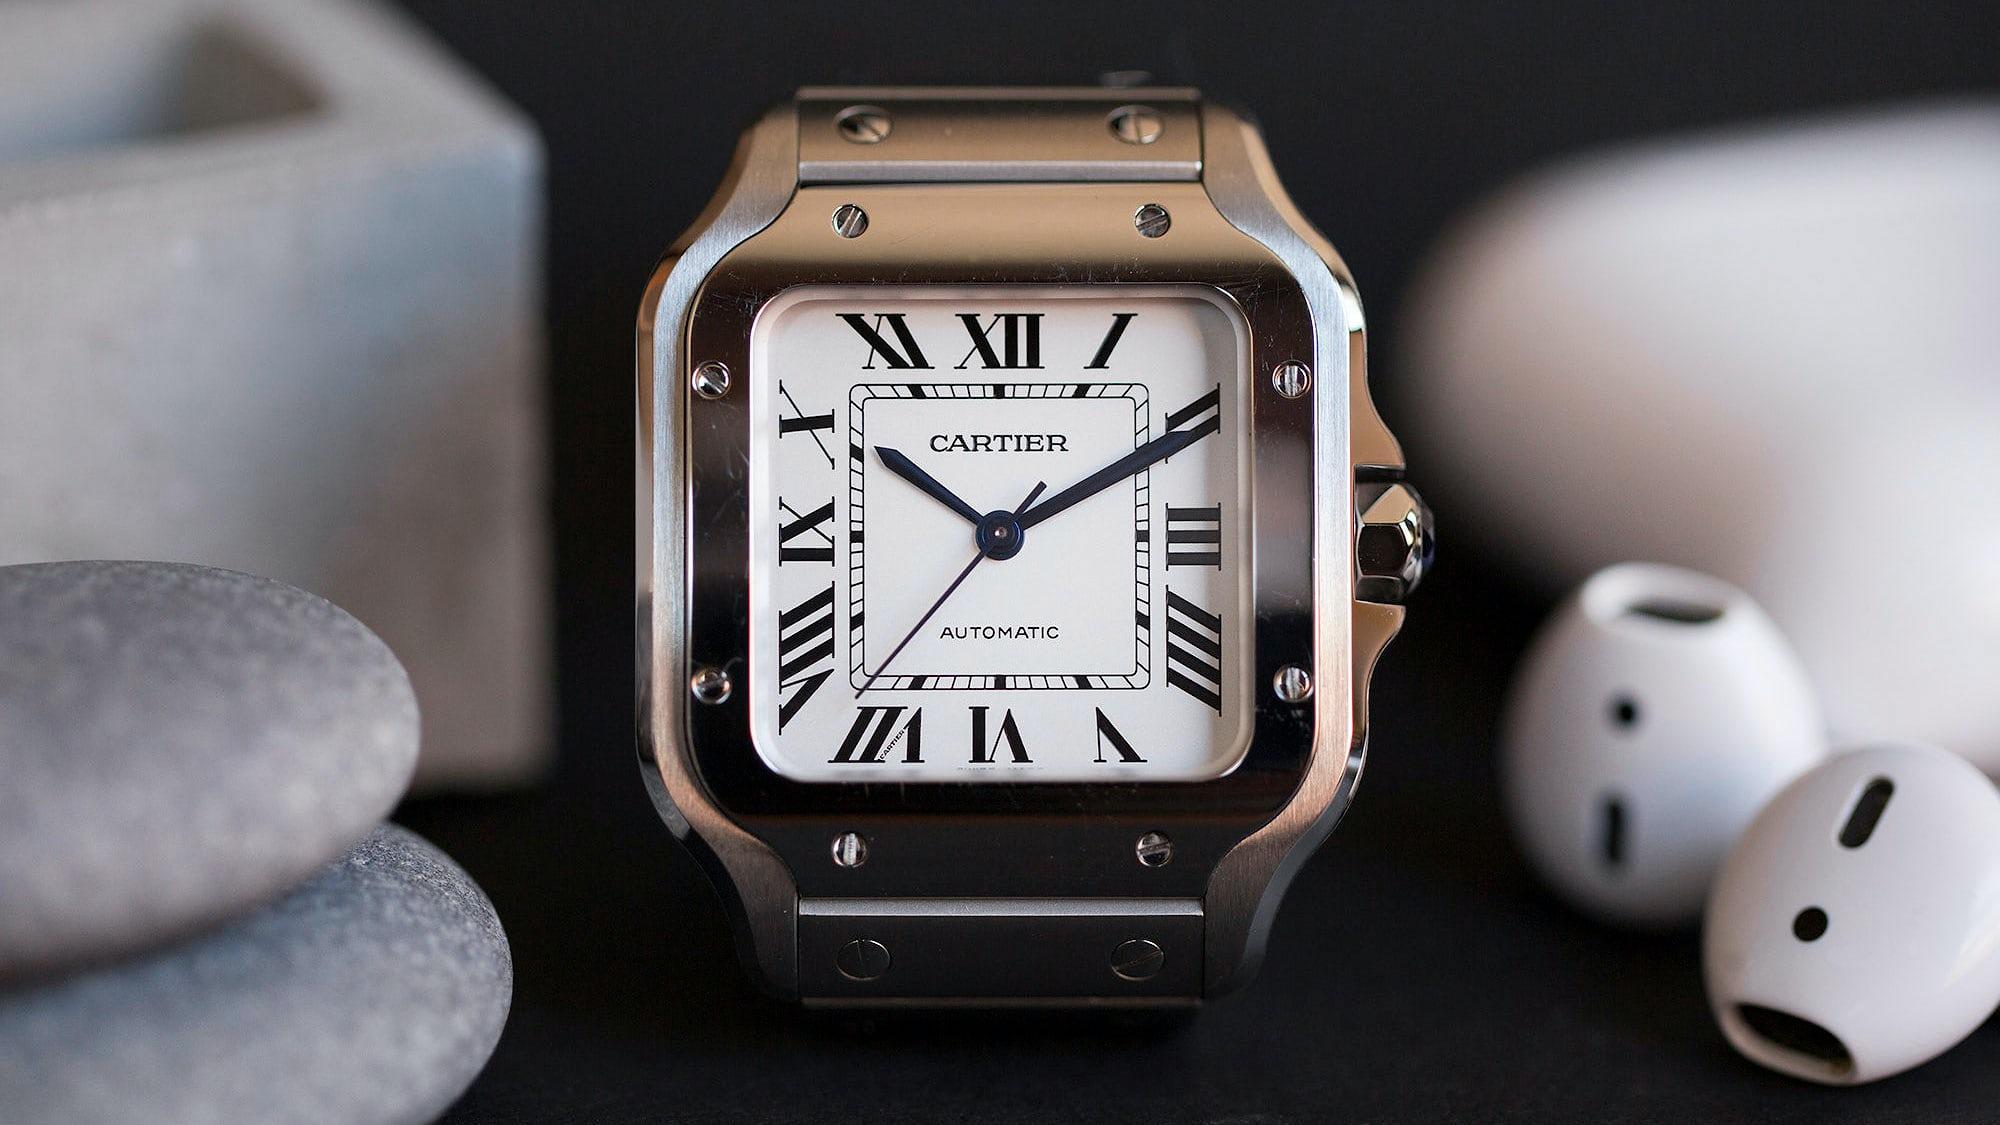 bdf546cb29c Business News  First-Half Watch Sales Rise At Richemont - HODINKEE